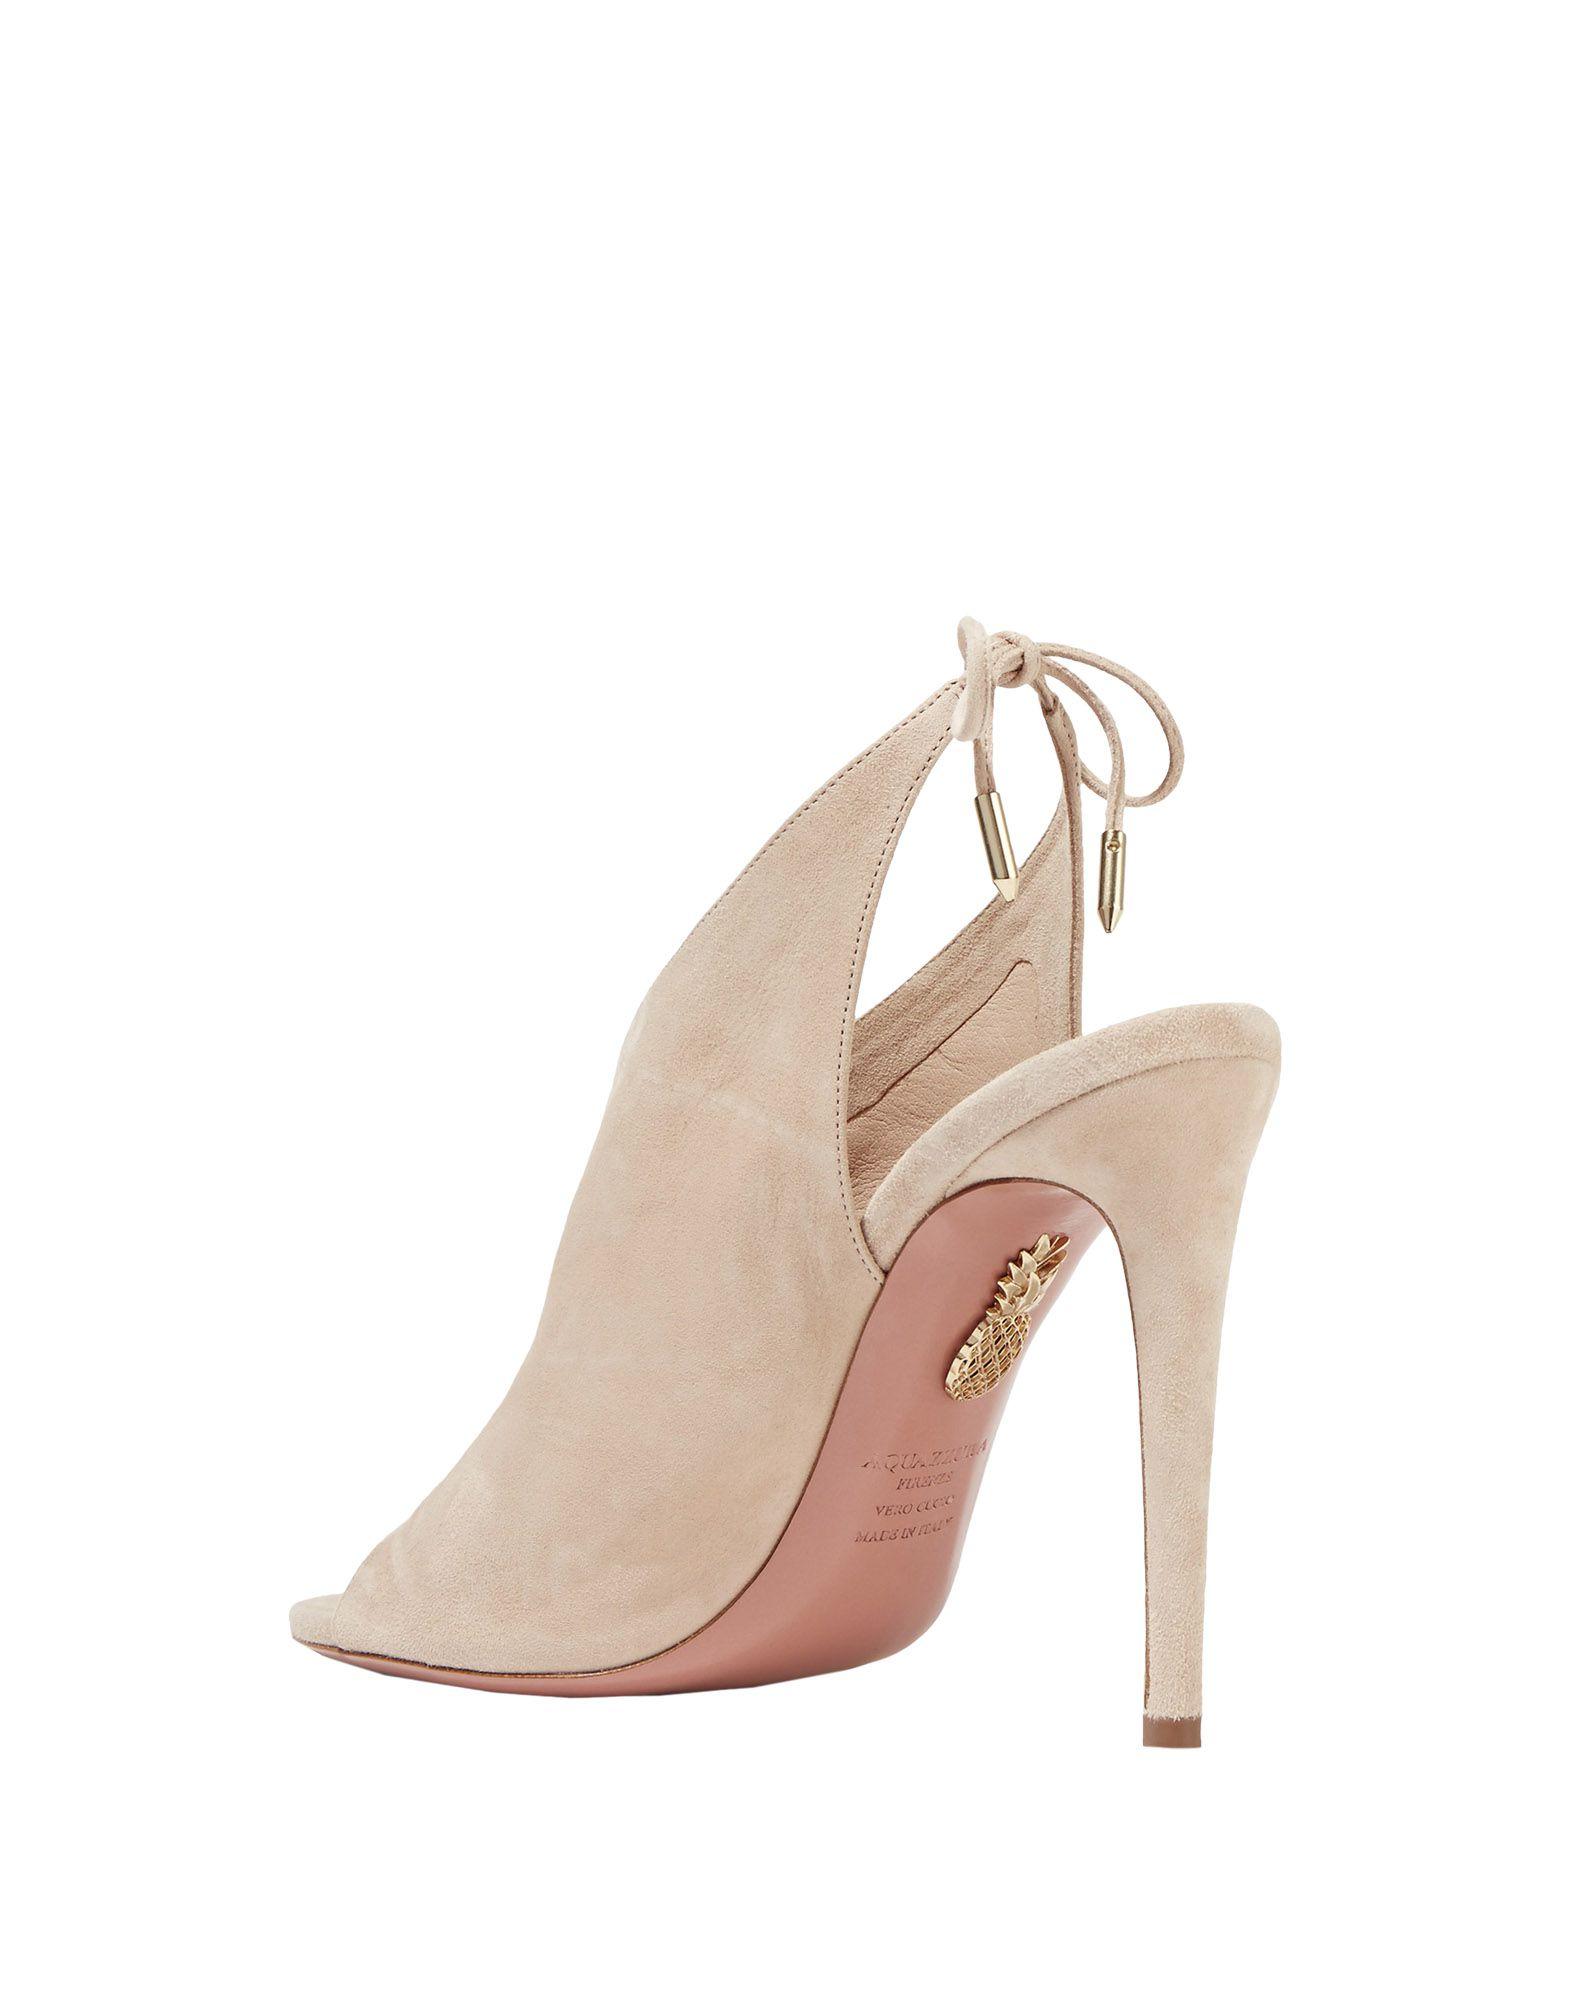 Aquazzura Sandalen Damen  11515179UPGut aussehende strapazierfähige Schuhe